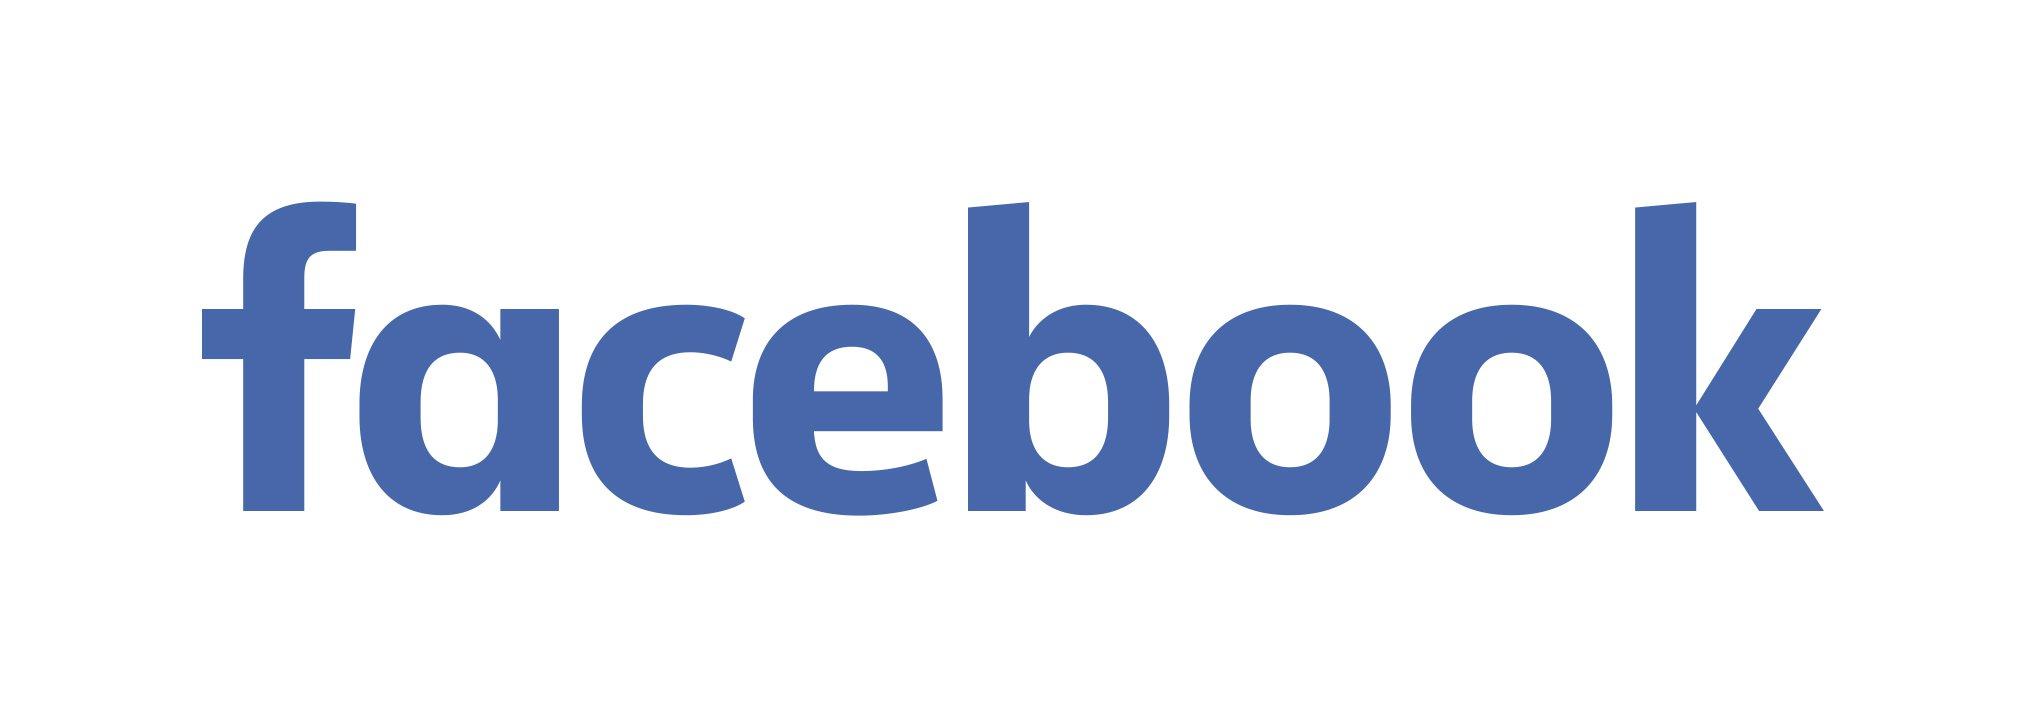 Facebook Logo Meaning